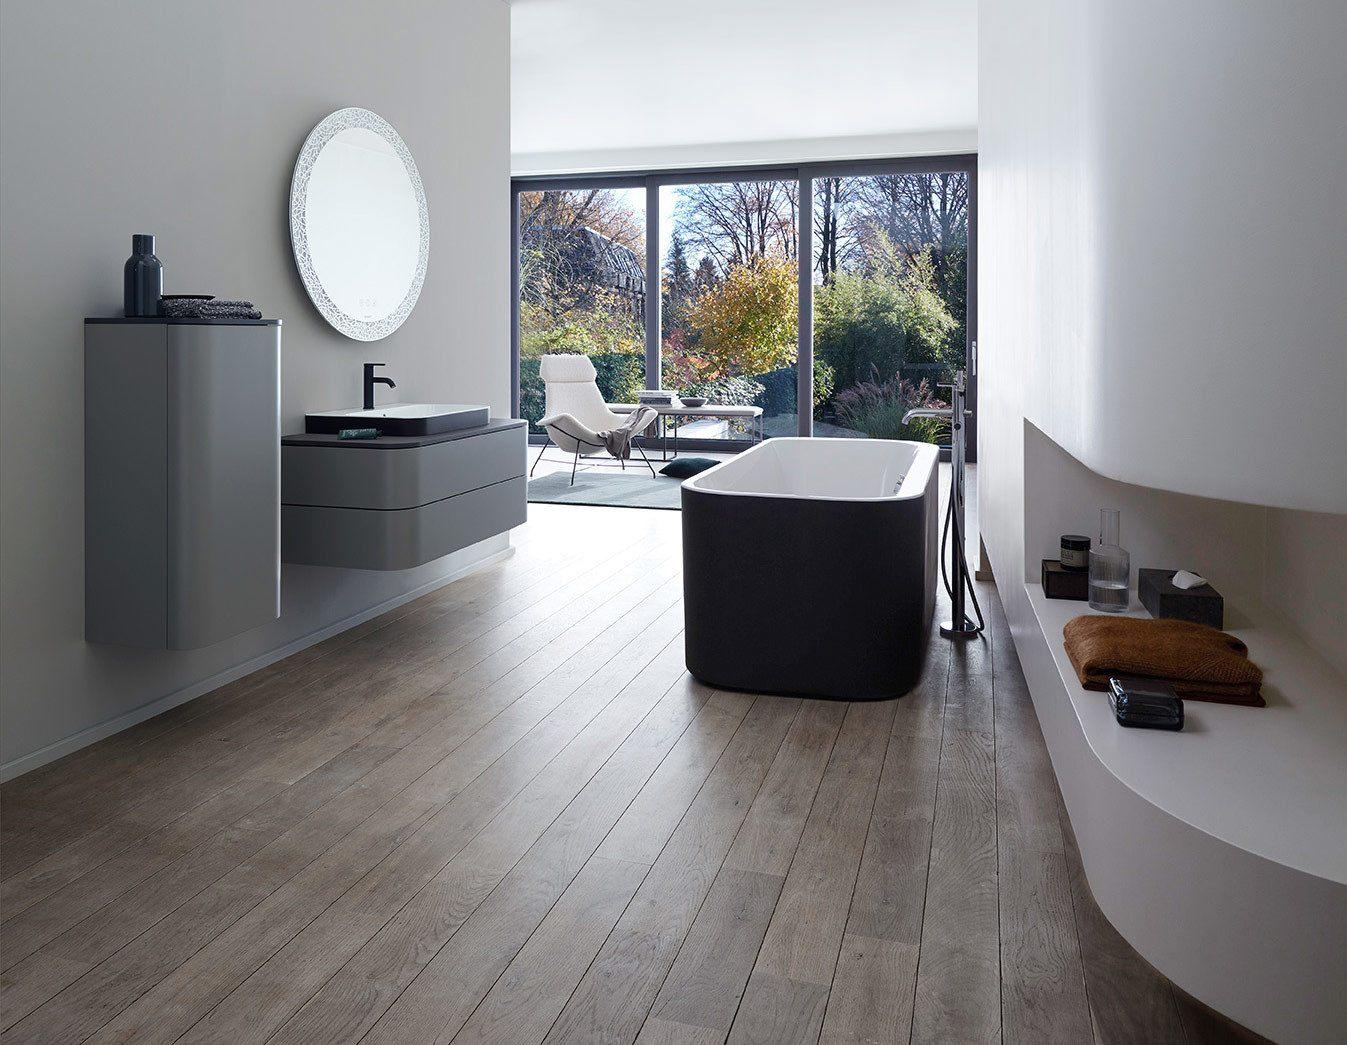 Duravit Happy D2 Freestanding Bath in high end bathroom